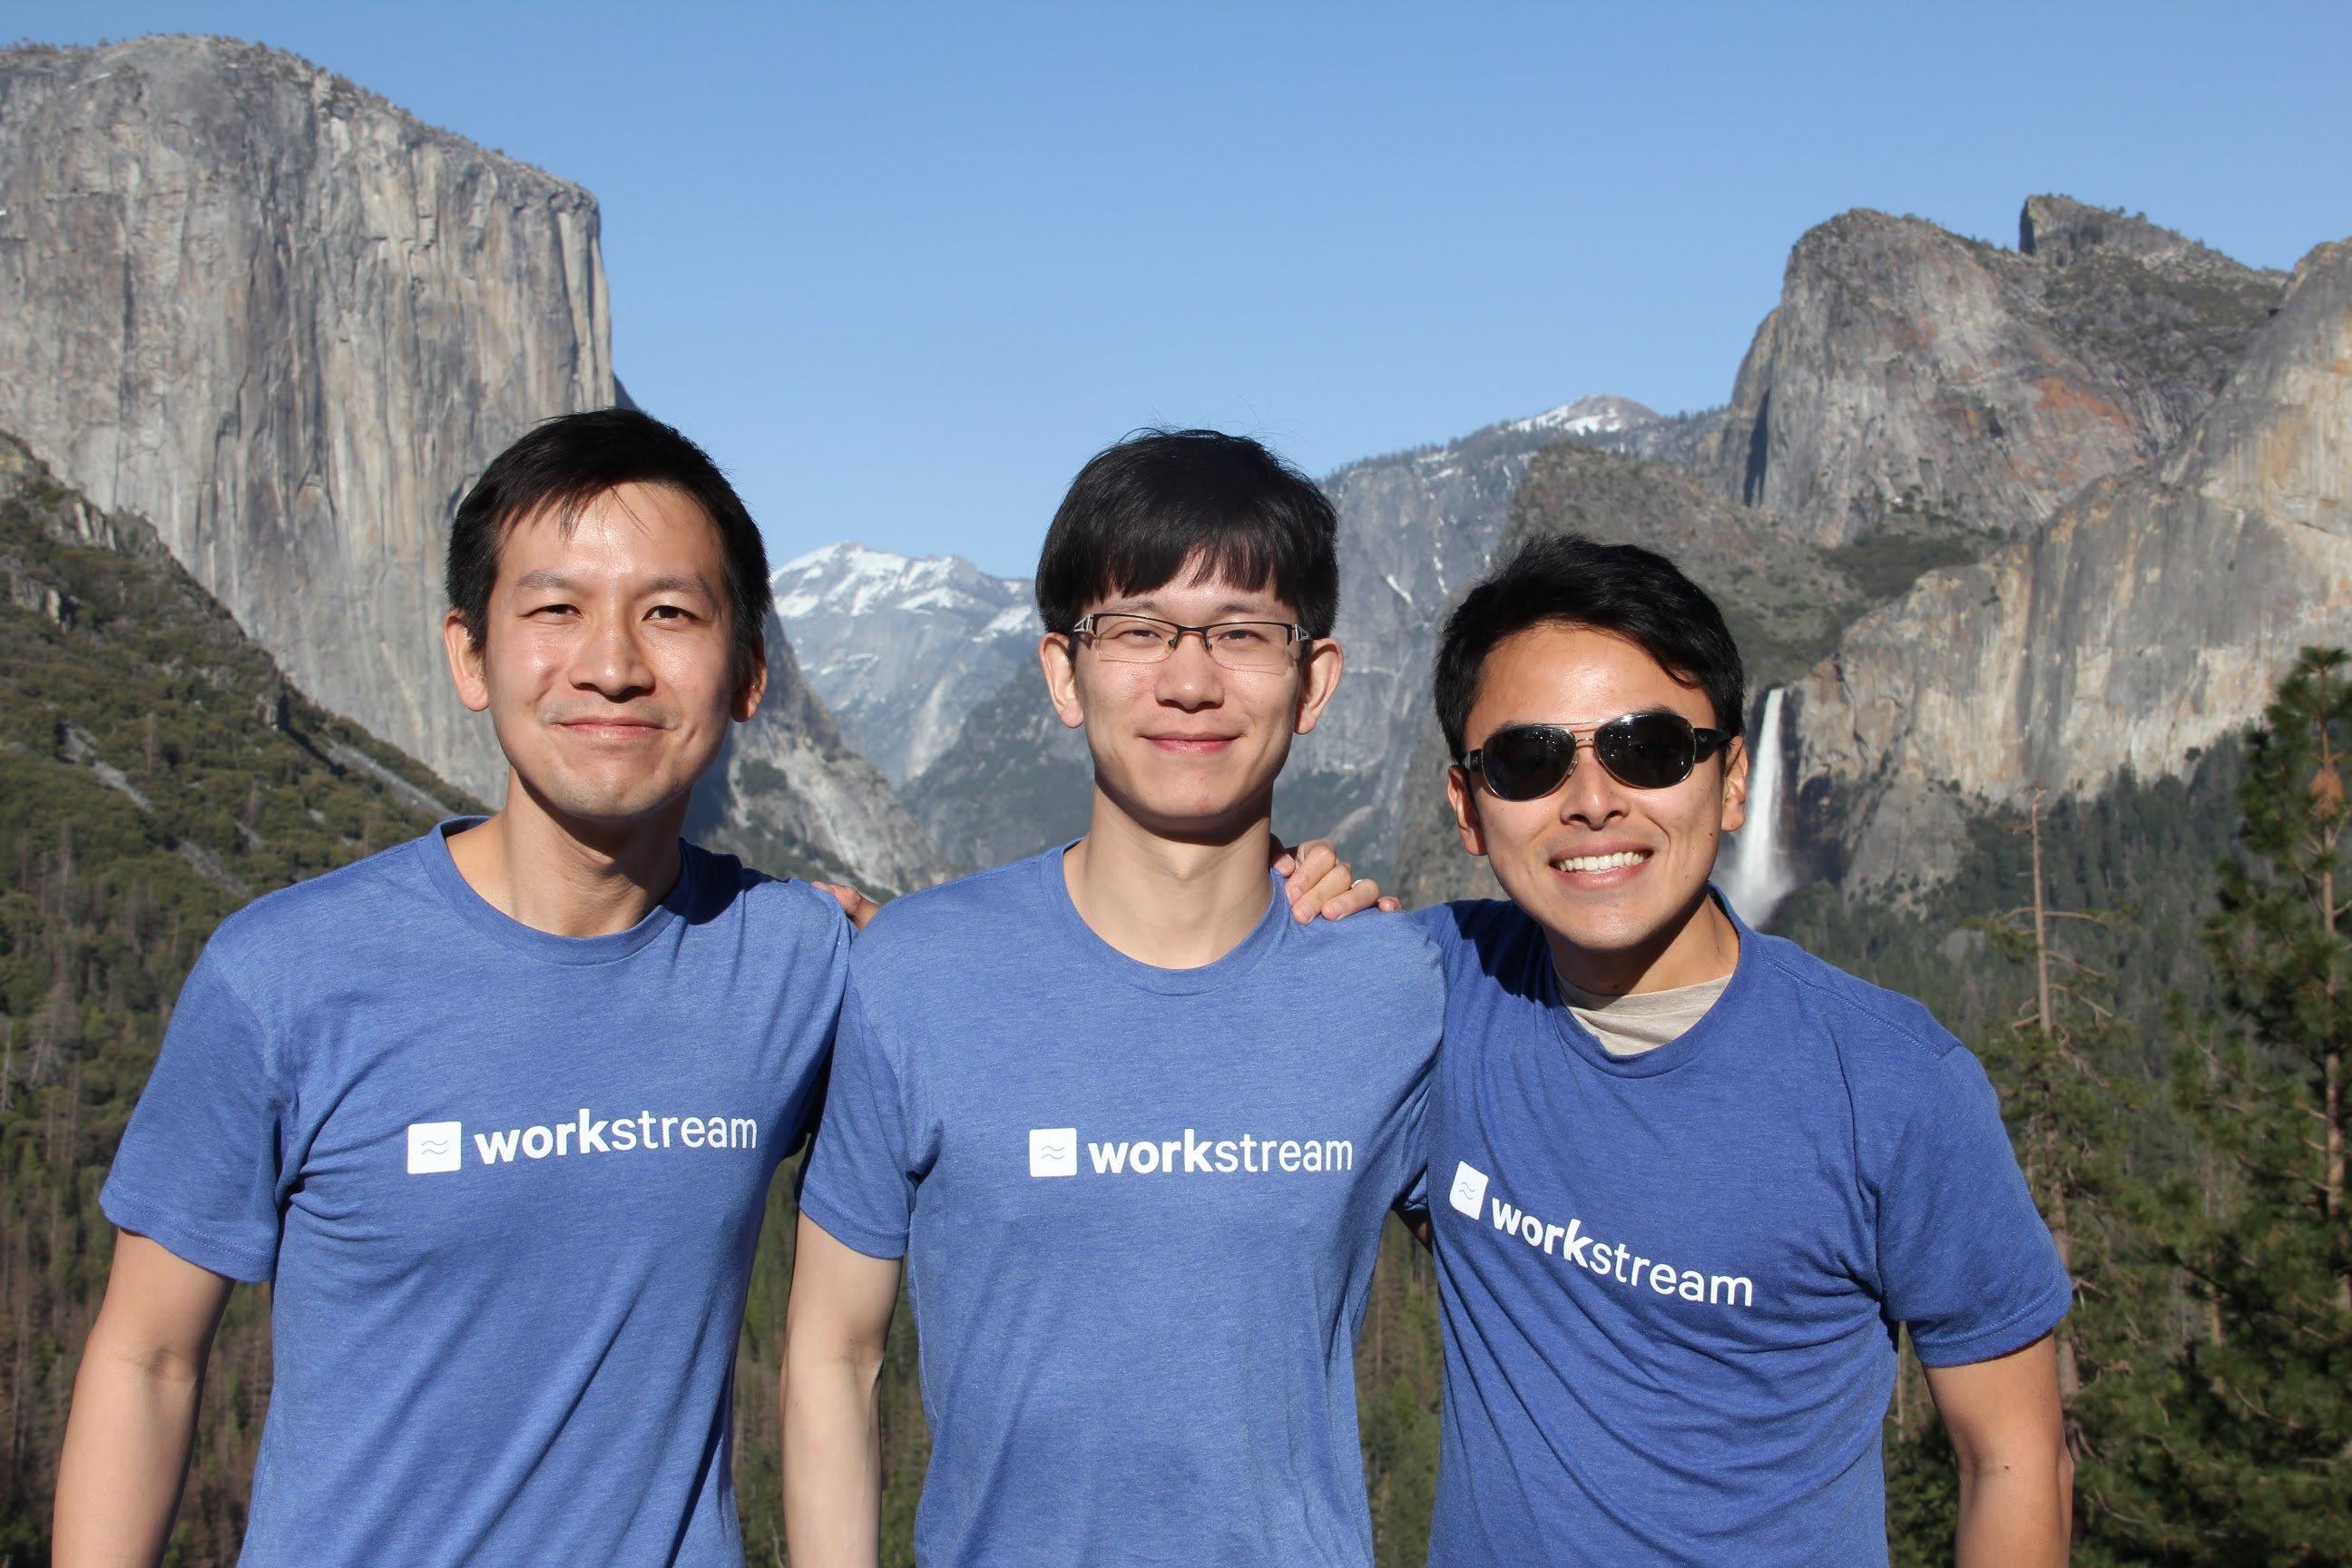 workstream founders desmond lim max wang and lei xu